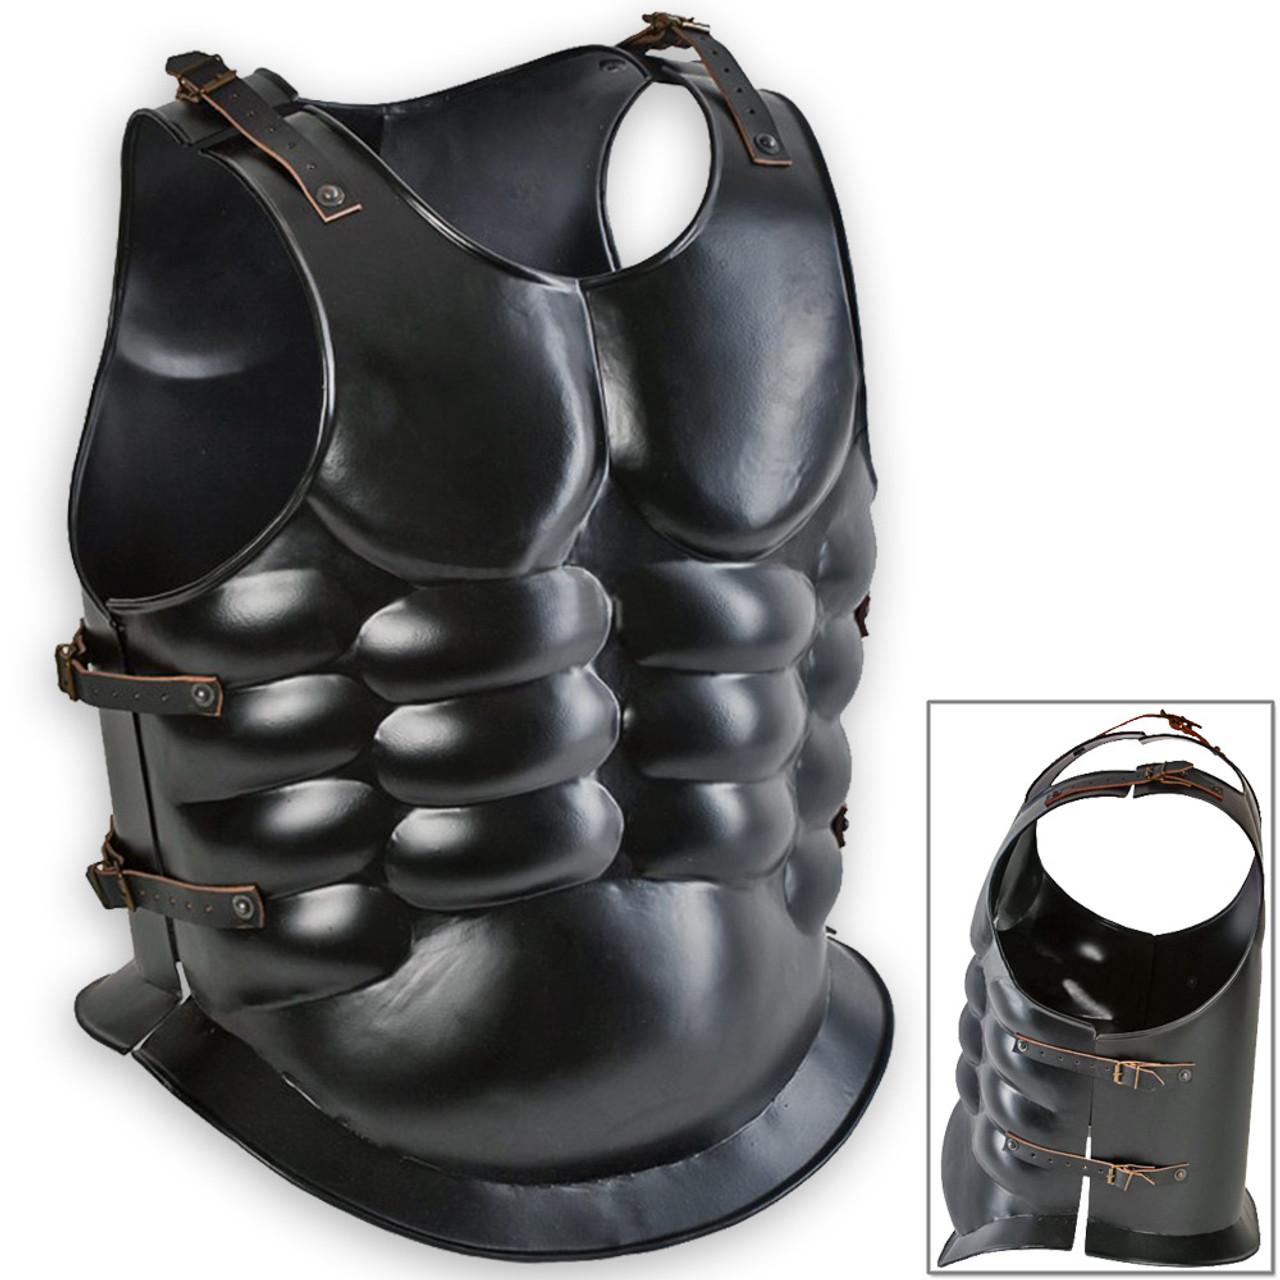 Churberg Hourglass 14th Century Armor Gauntlets Functional 18 Gauge Carbon Steel